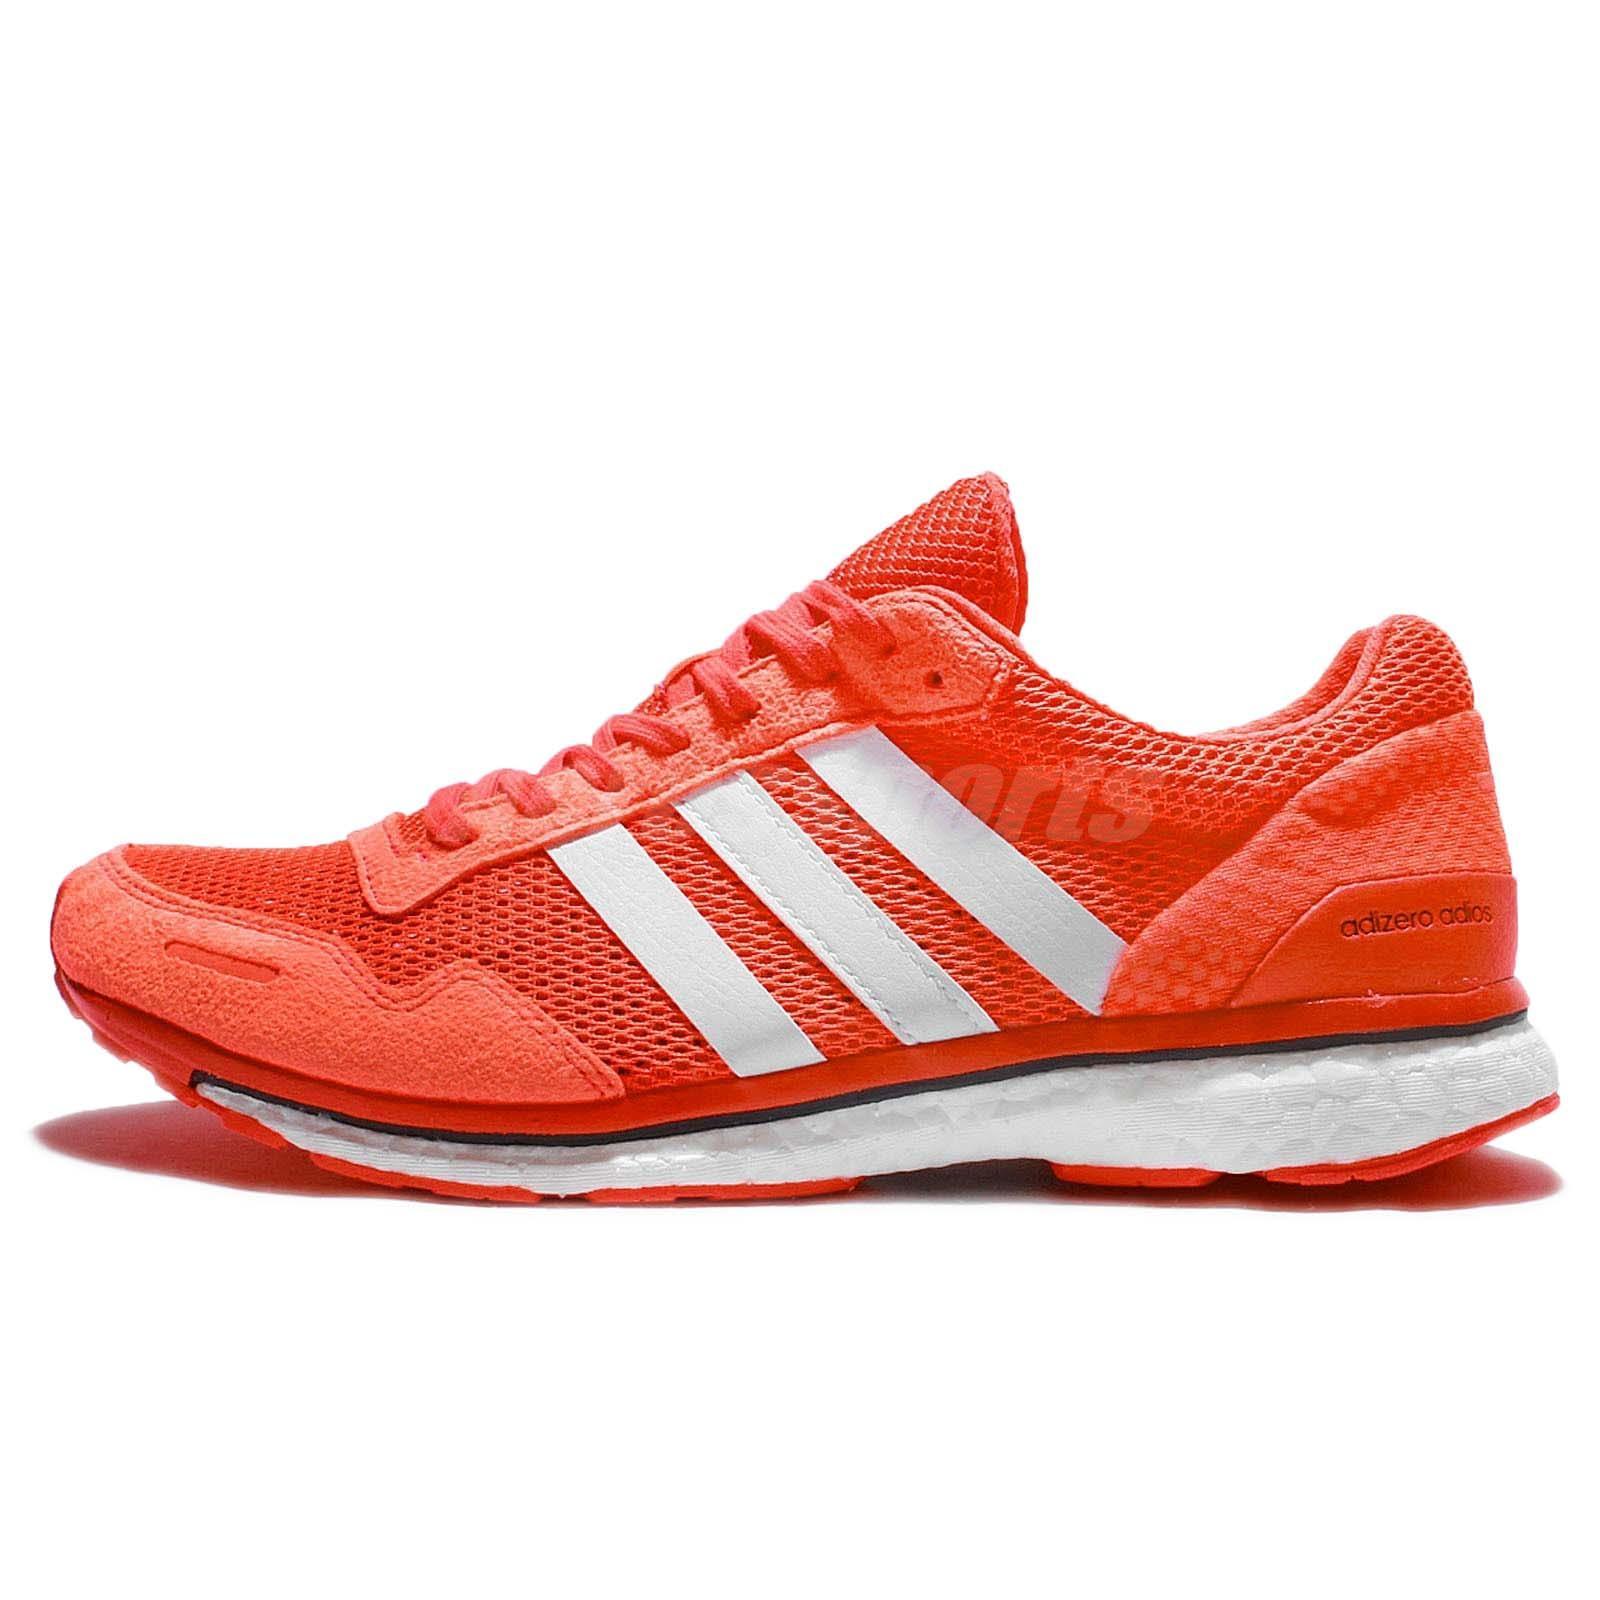 adidas adizero adios 3 m continental boost orange white men running shoes aq2429. Black Bedroom Furniture Sets. Home Design Ideas